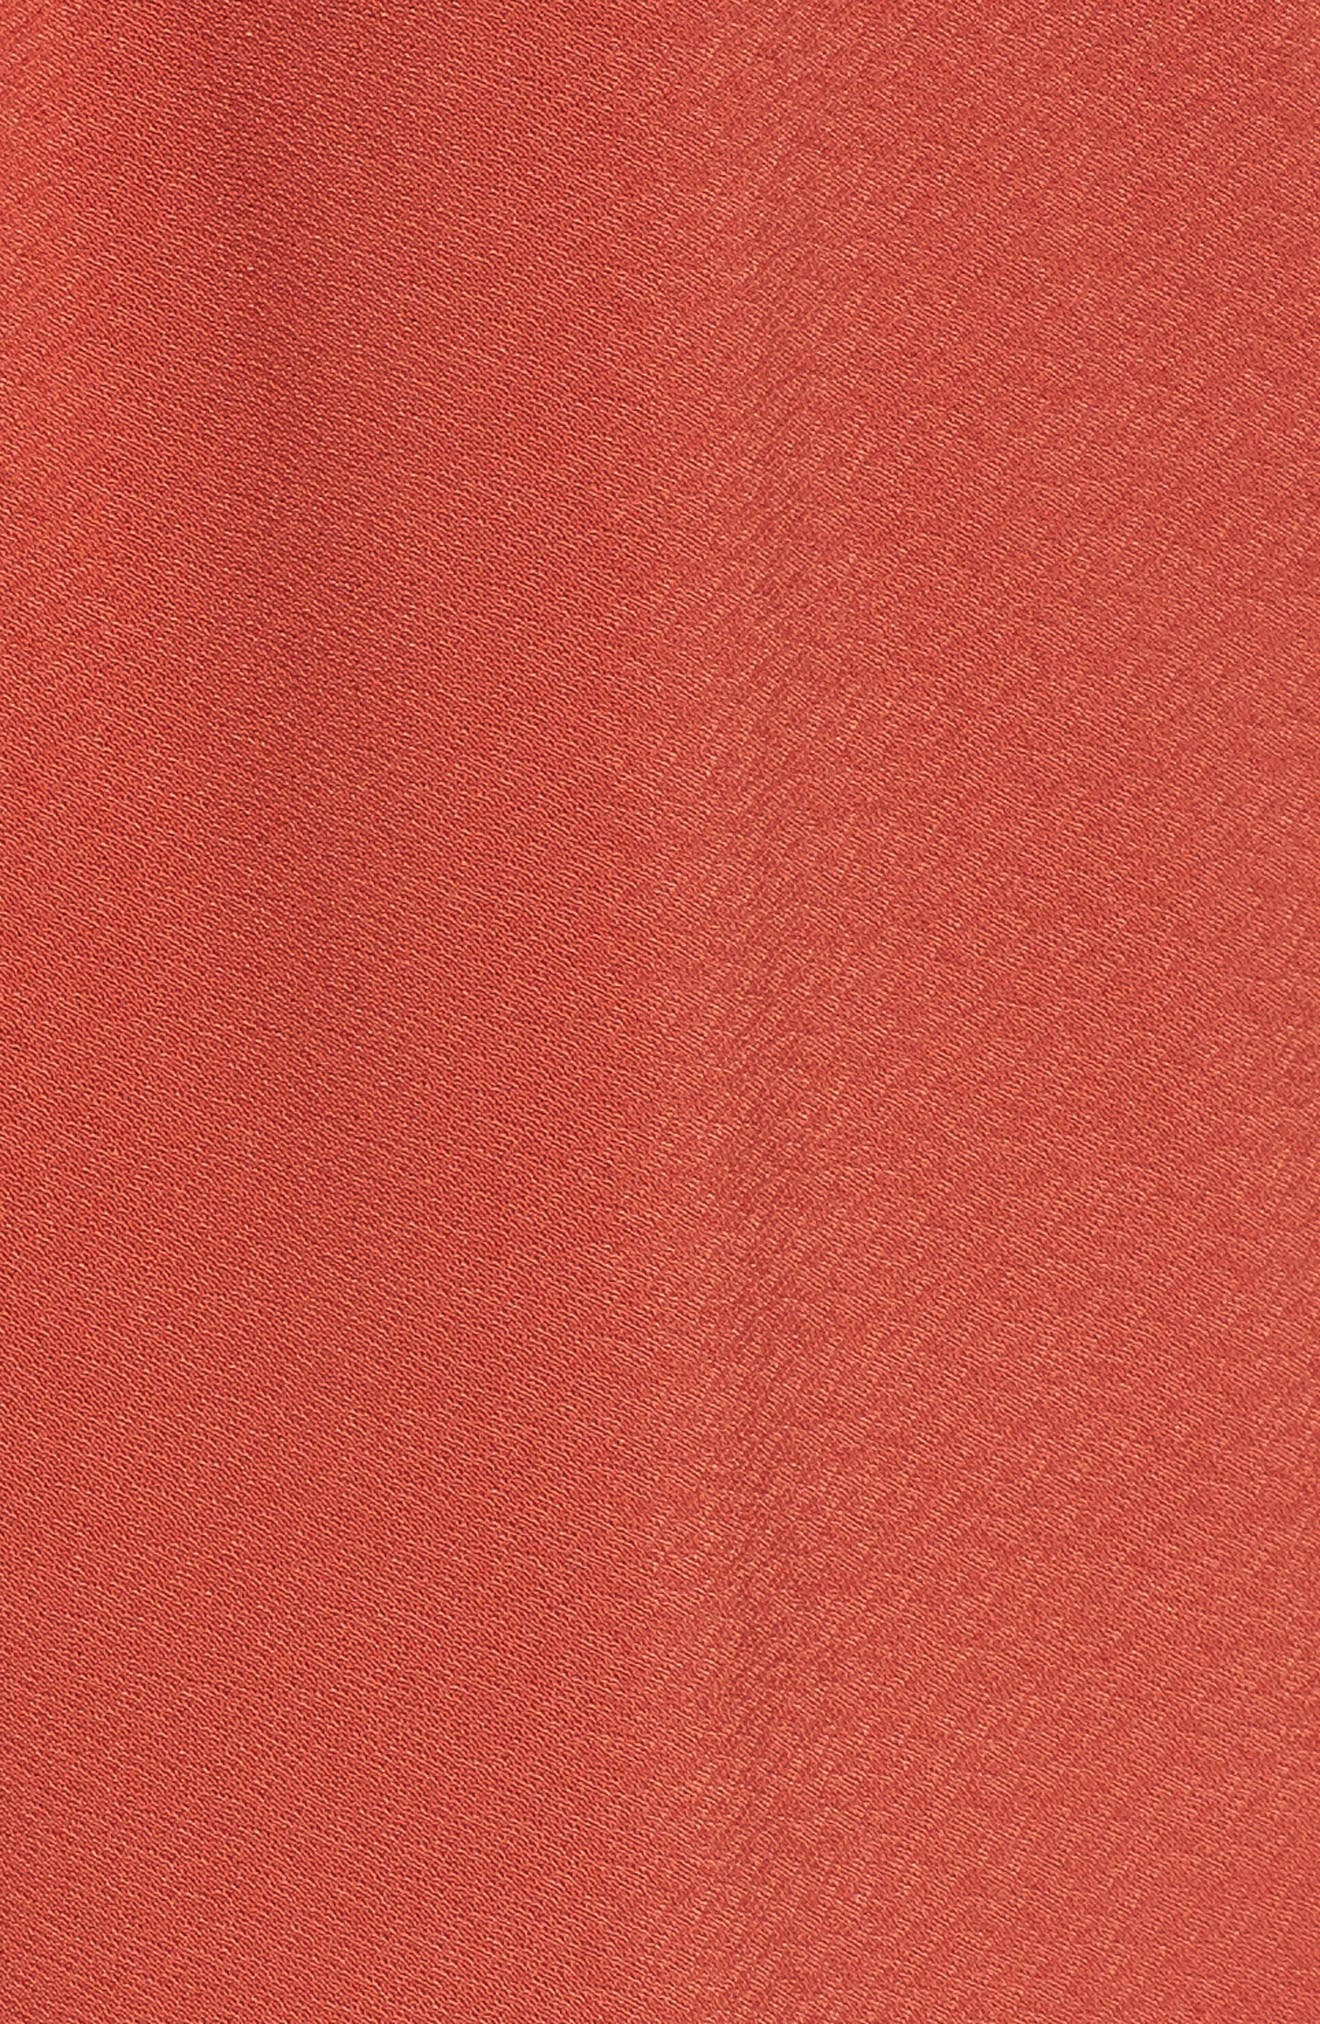 Pleat Front Shorts,                             Alternate thumbnail 5, color,                             Rust Bossa Nova